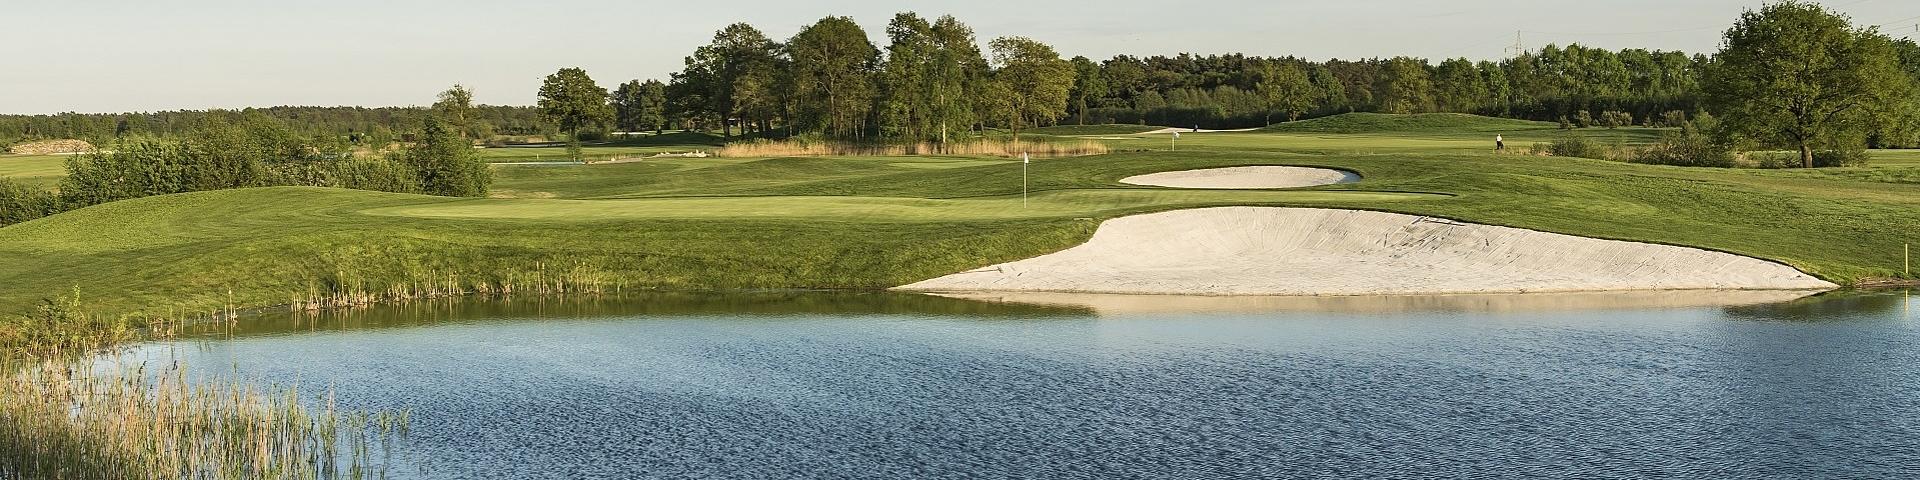 Golf I Hamborg